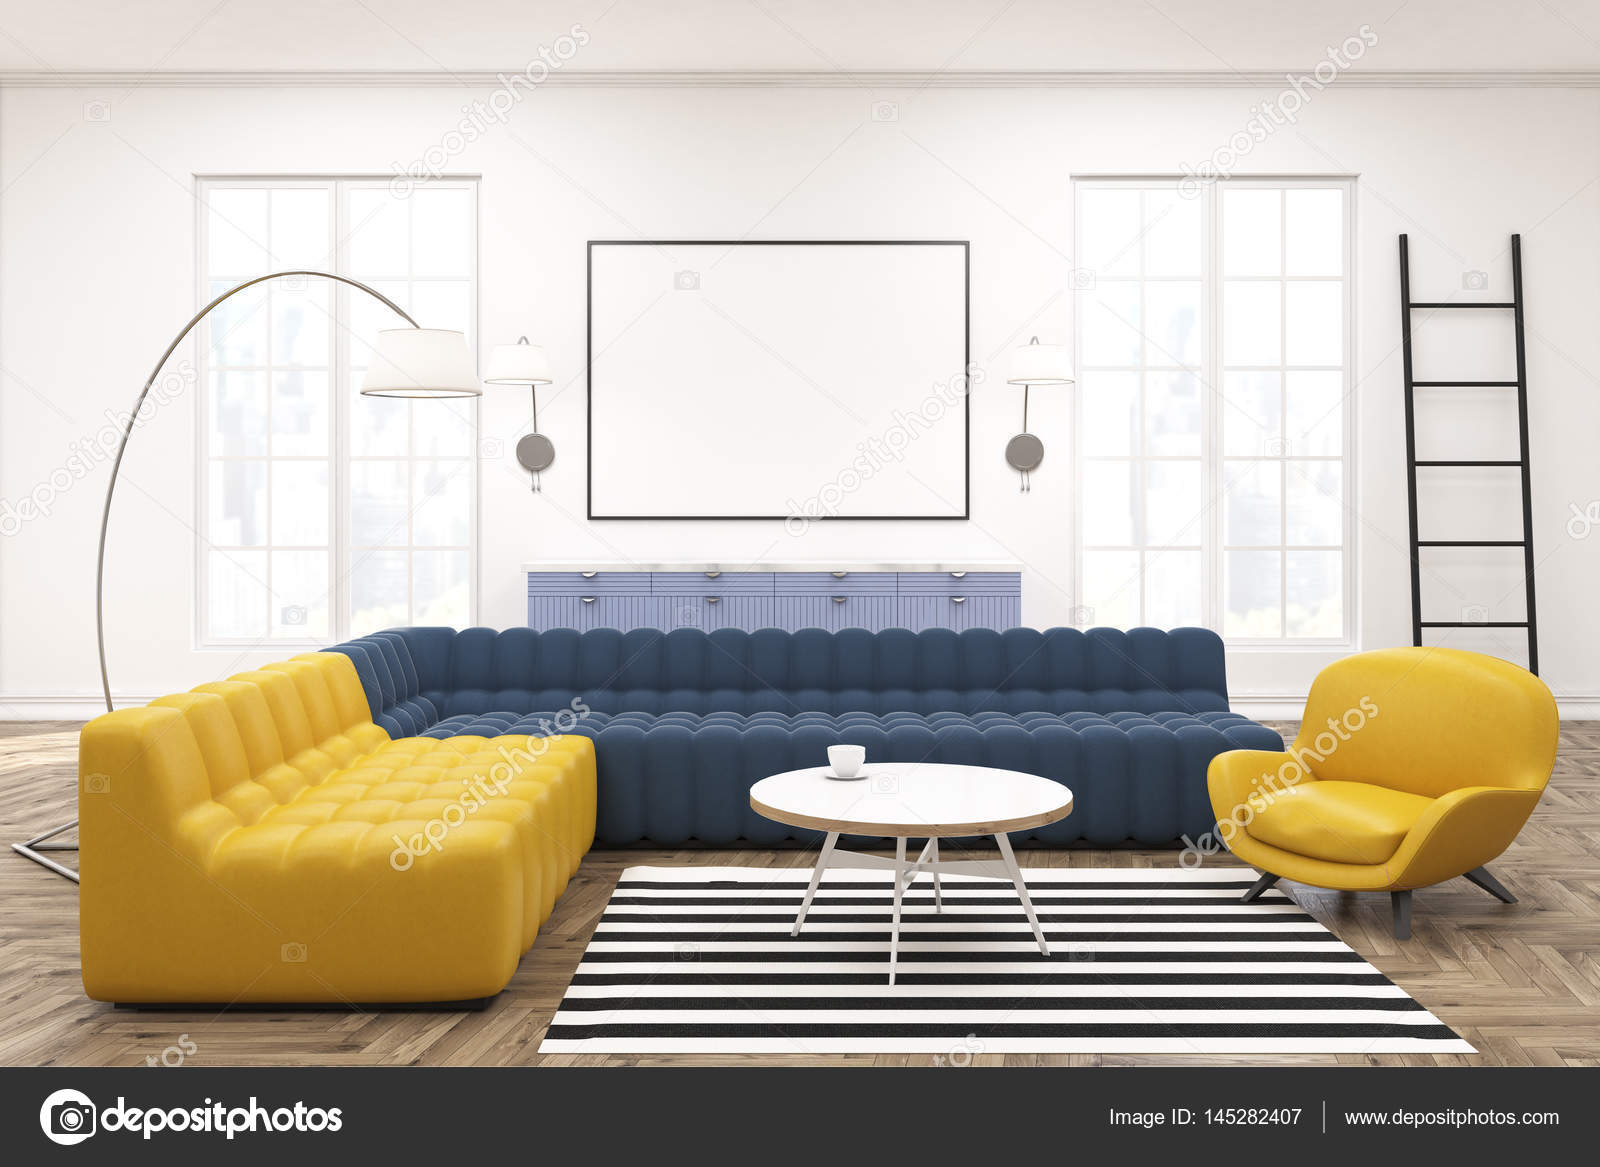 moderne lounge interieur poster banken stockfoto